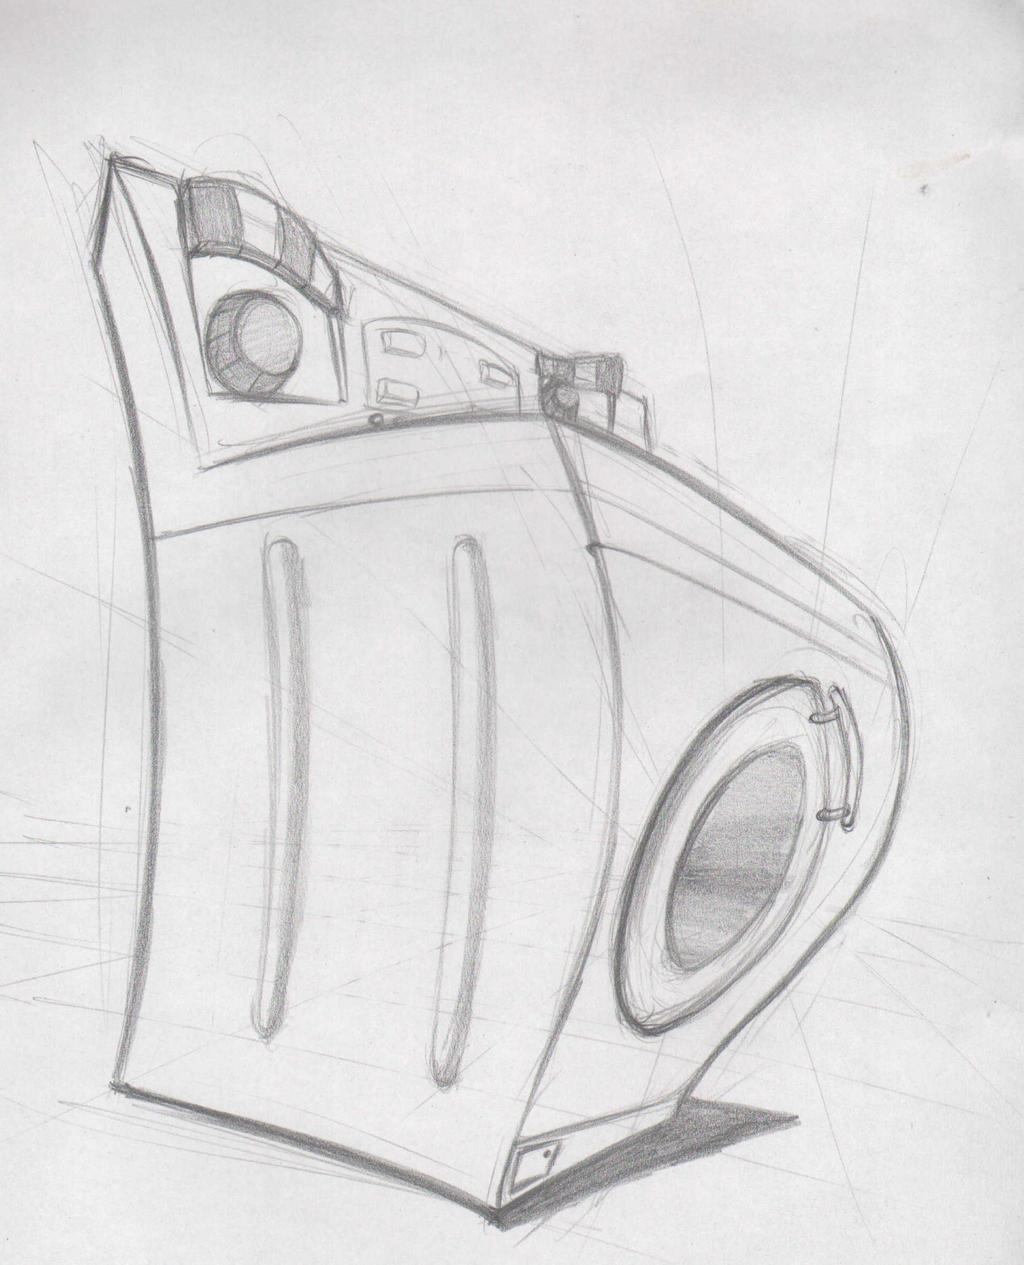 washing machine sketch. comiccon sketch - the washing machine by mokuu n